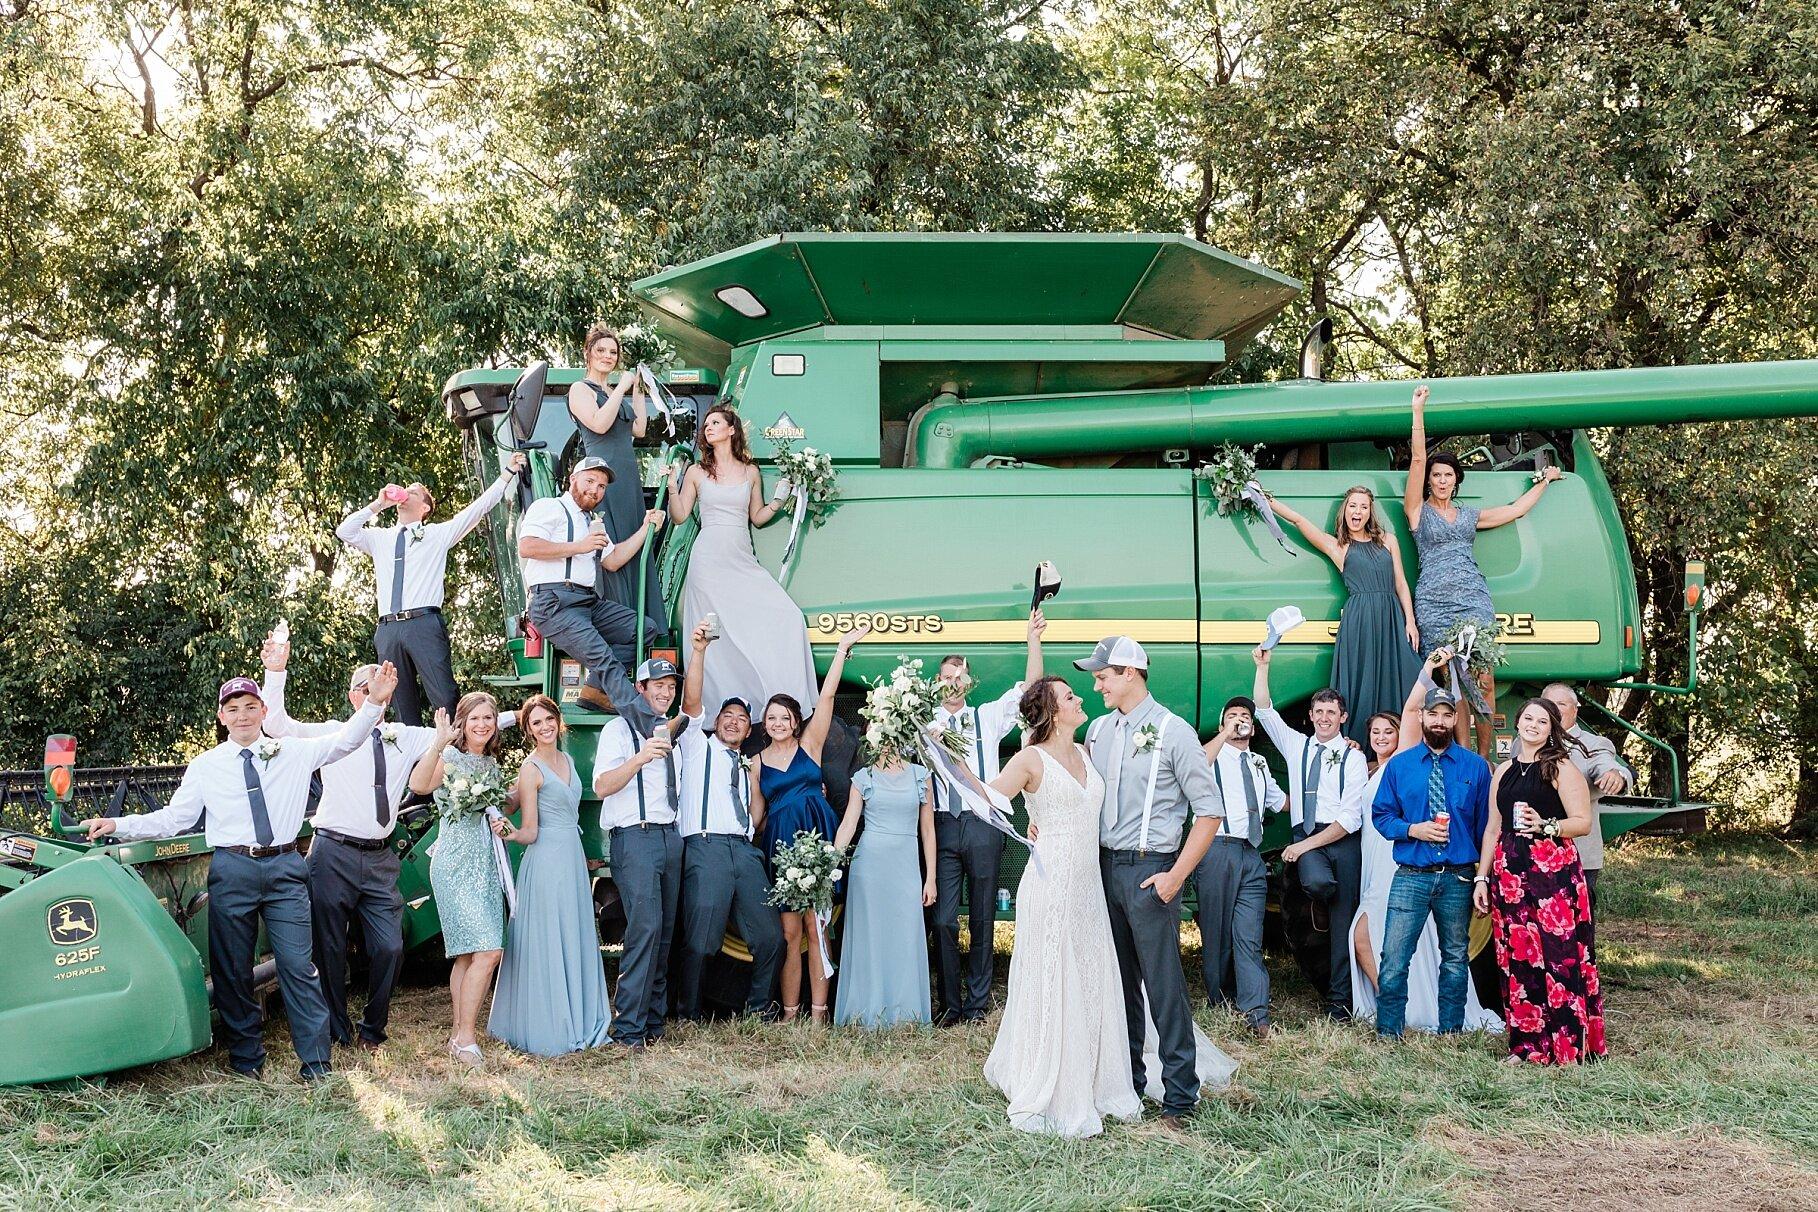 Earth-Toned Wedding by KKP Associate Wedding Photographer and Kelsi Kliethermes Photography Best Columbia Missouri Wedding Photographer_0007.jpg